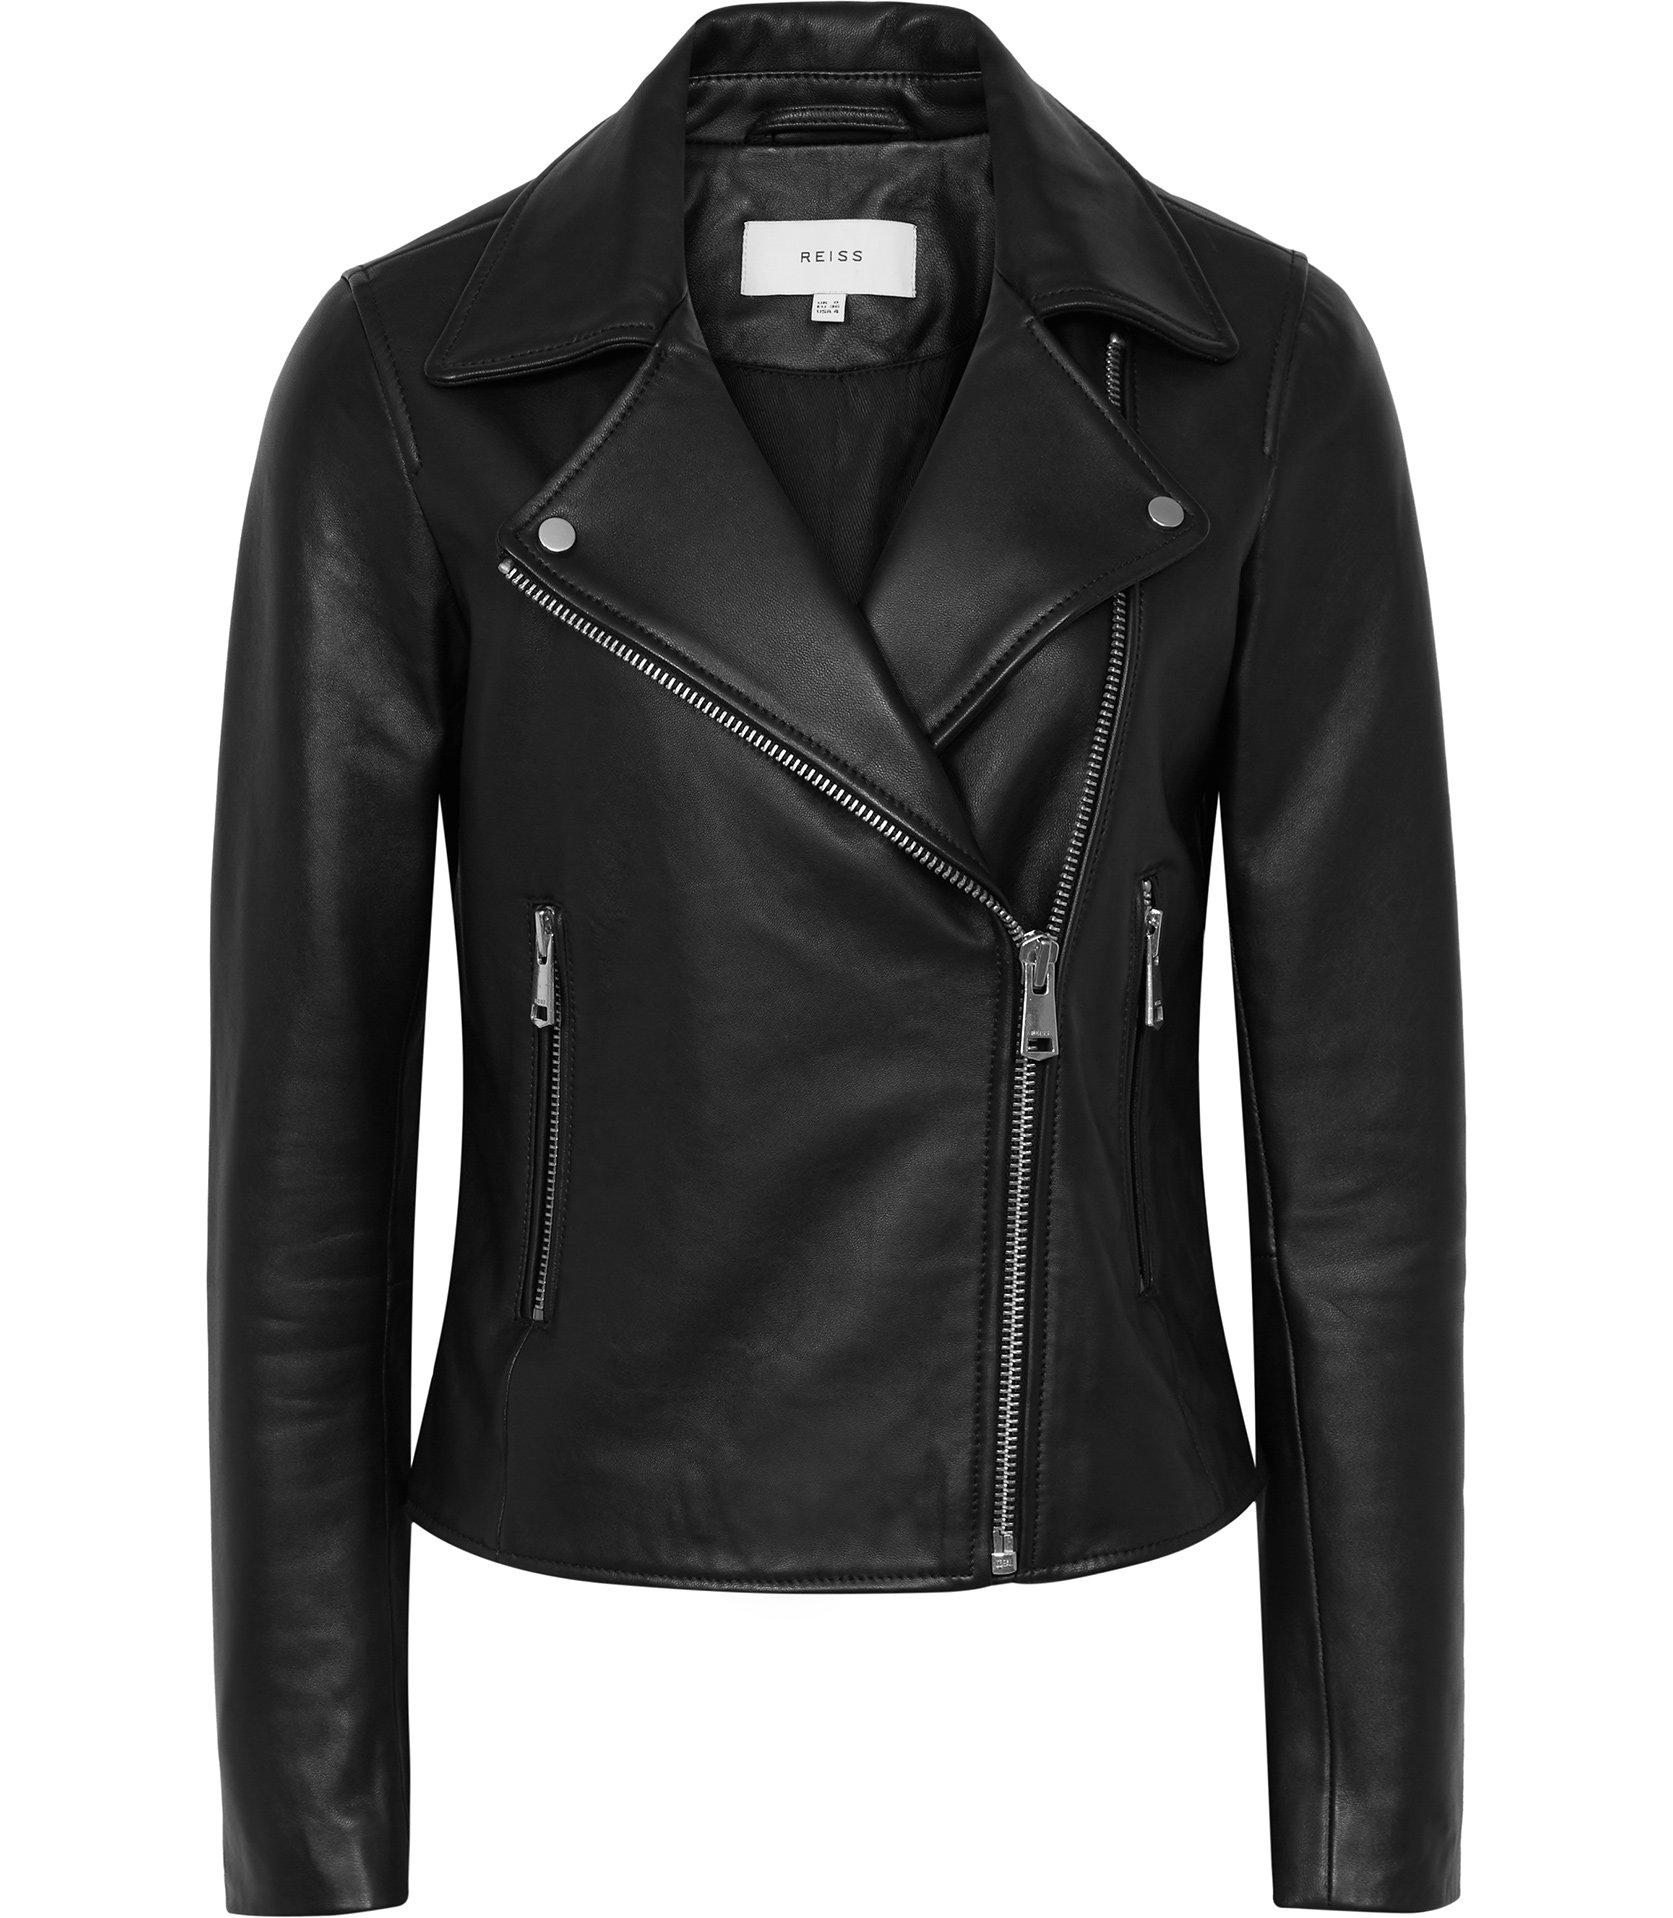 Women's Leather Coats & Jackets